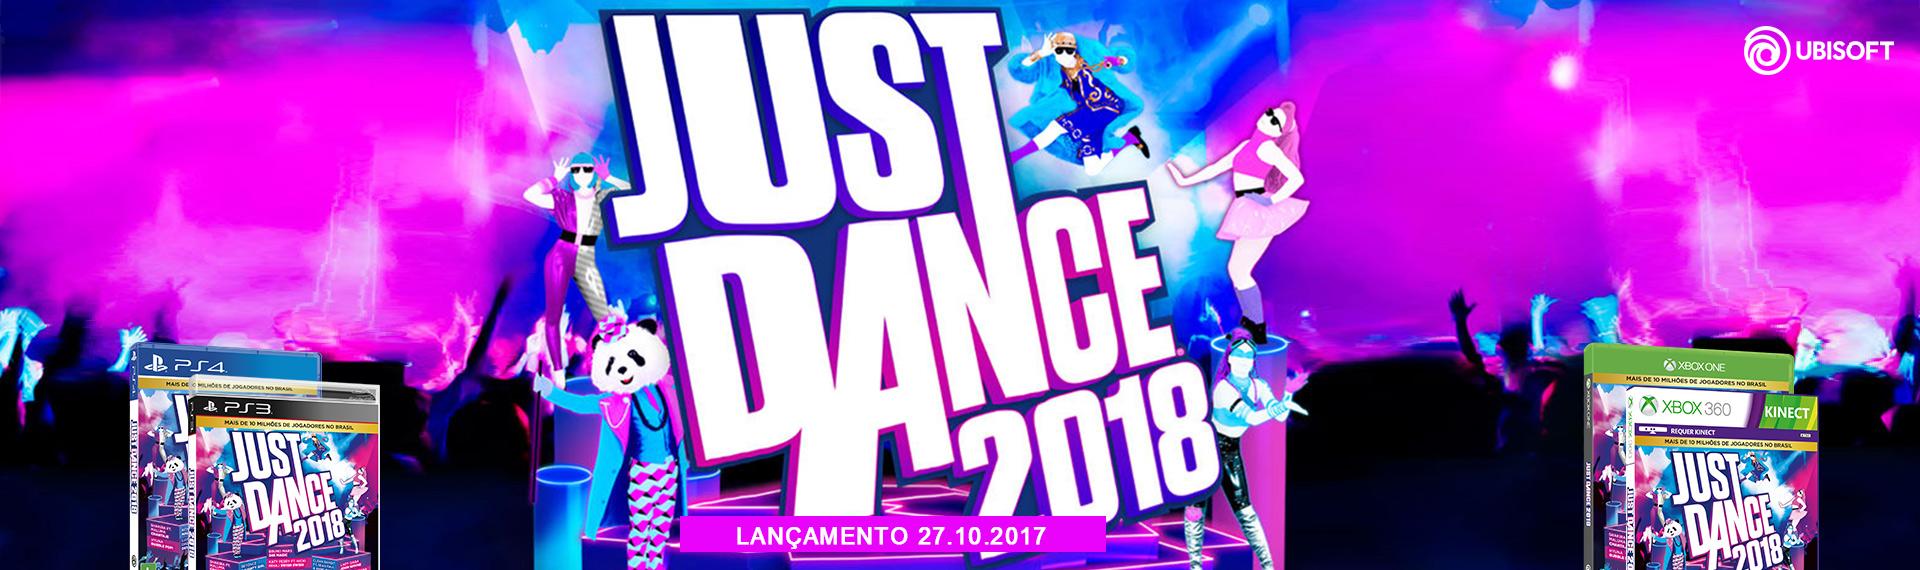 Justin Dance